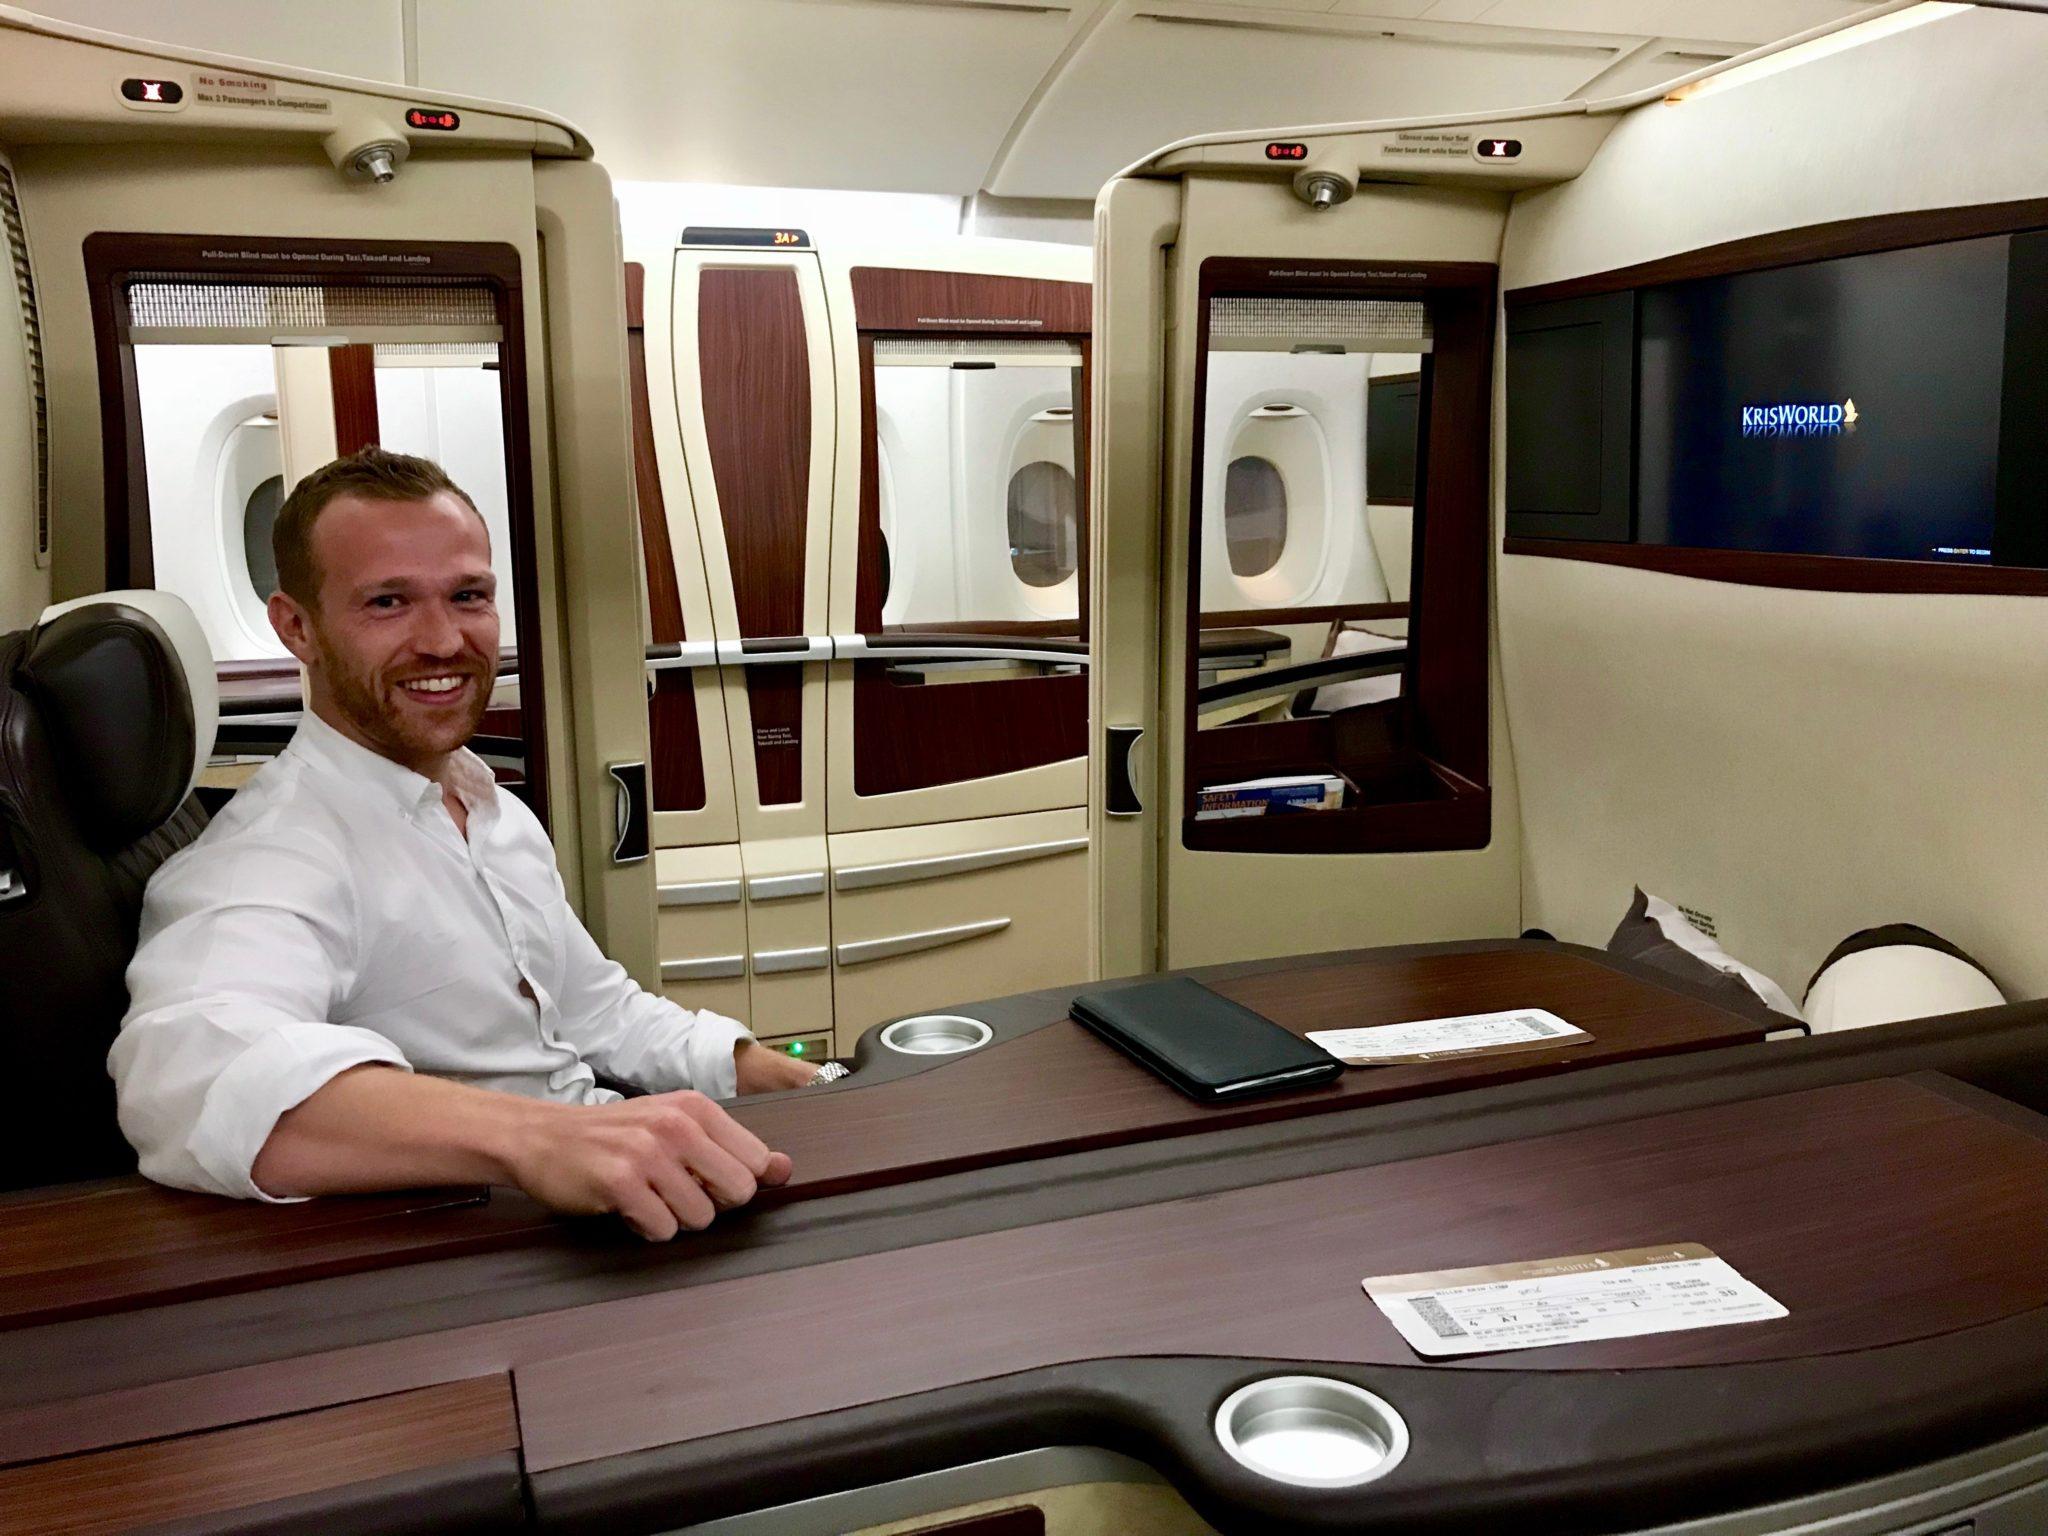 Singapore Suites First Class - Pre-flight